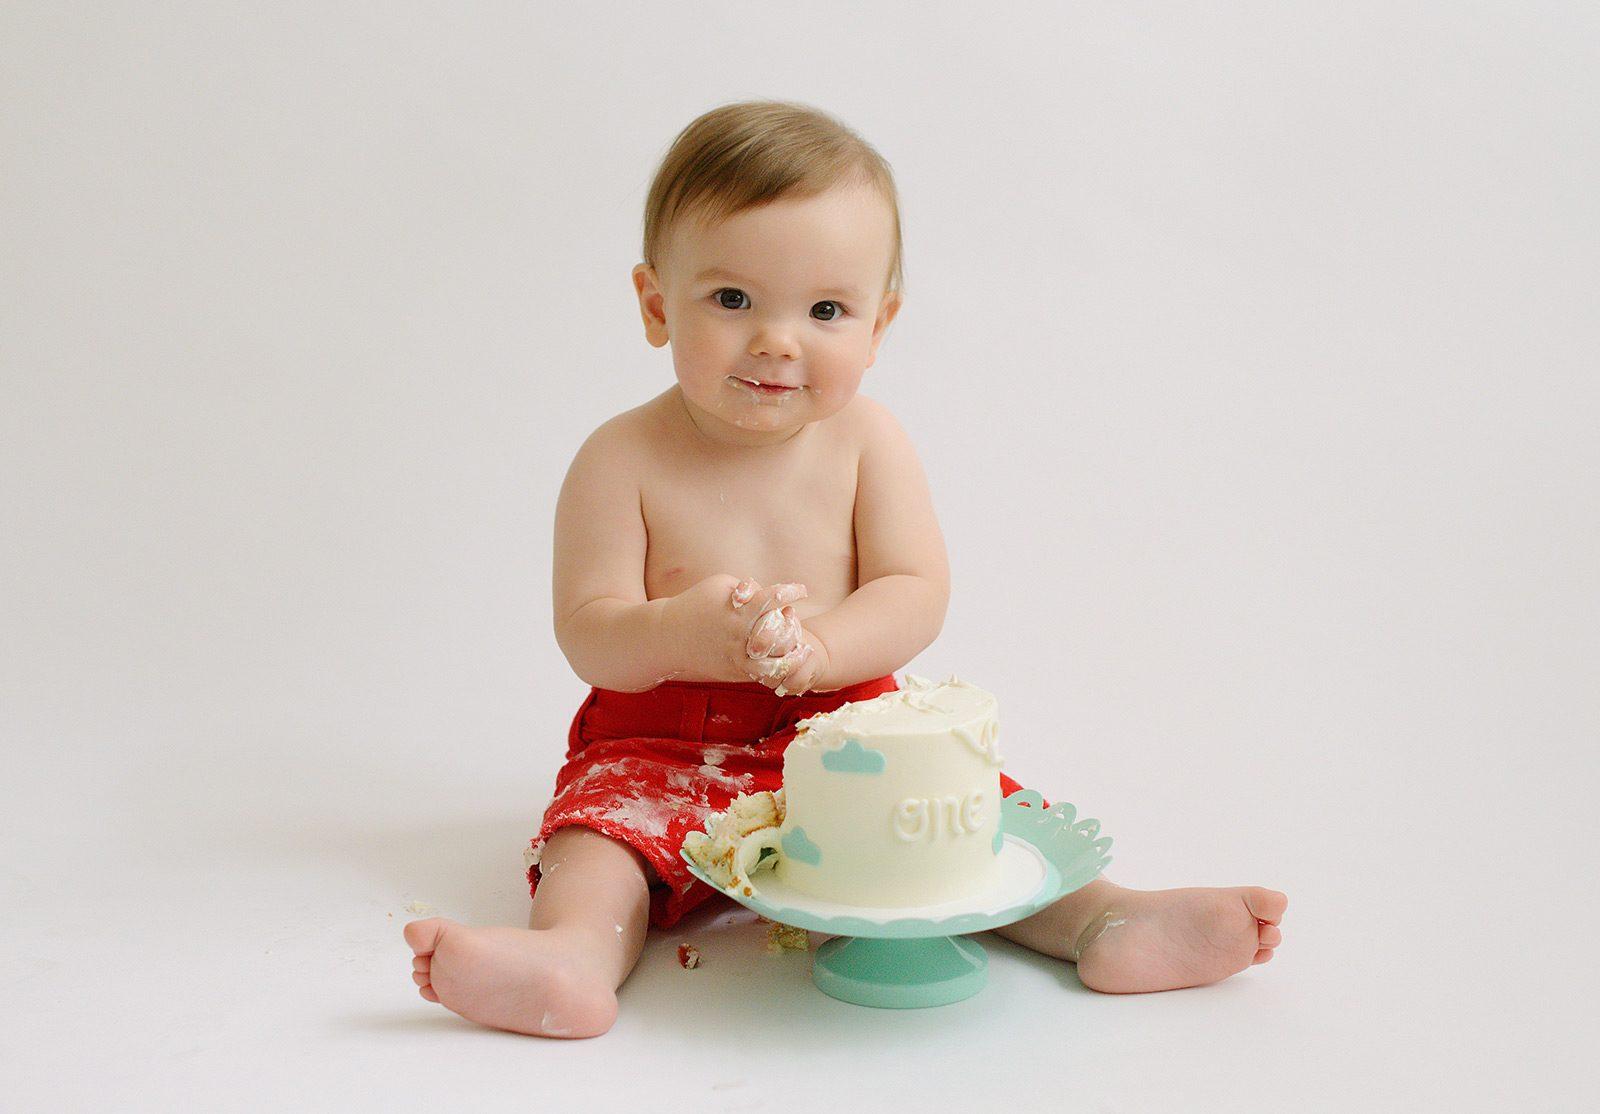 cake-07